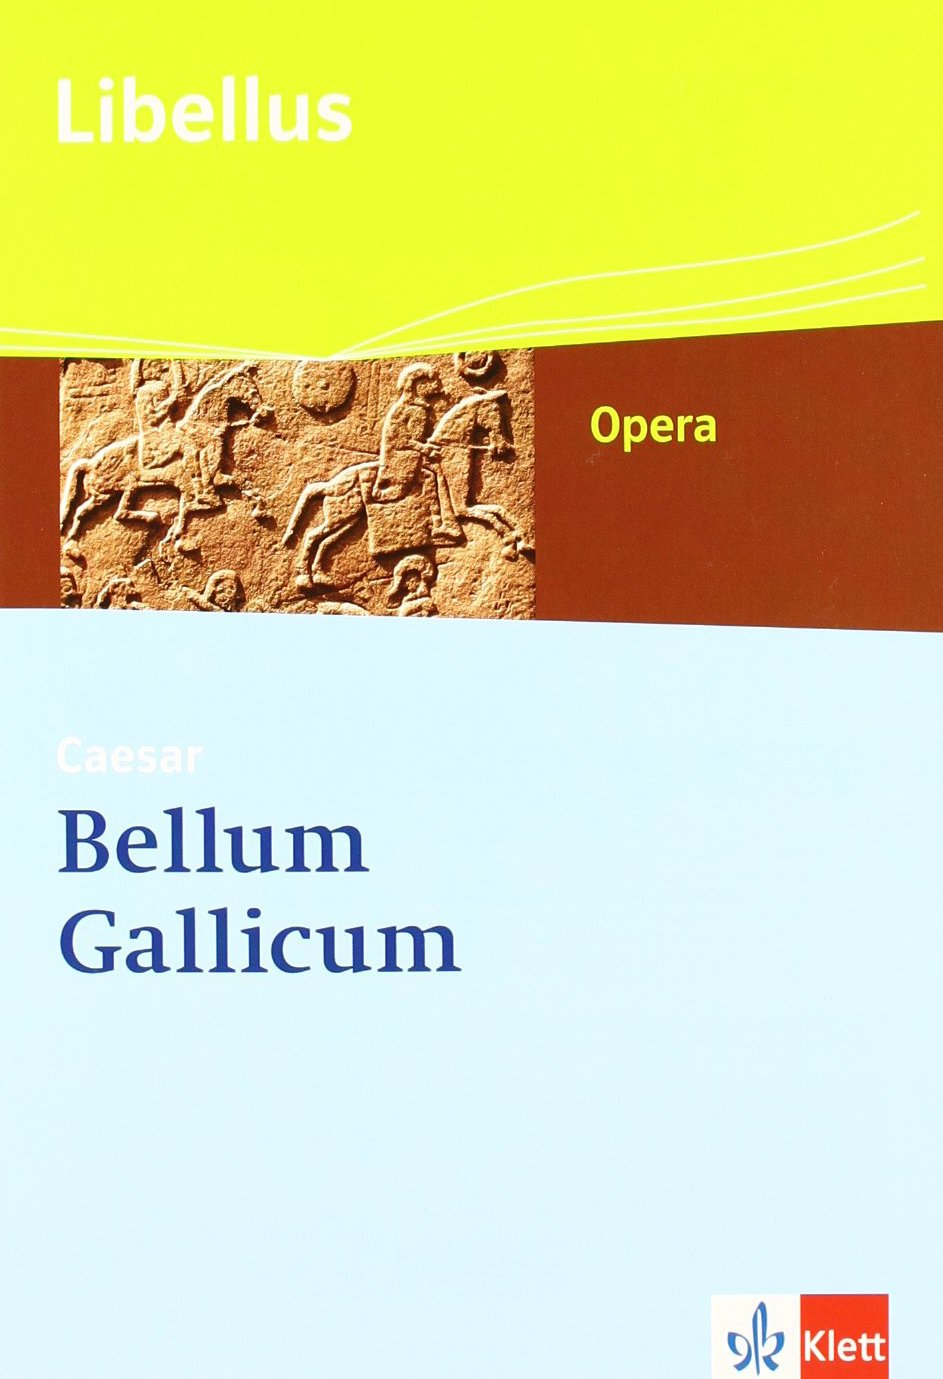 bellum-gallicum-caesar-feldherr-politiker-vordenker-mit-cd-rom-libellus-opera